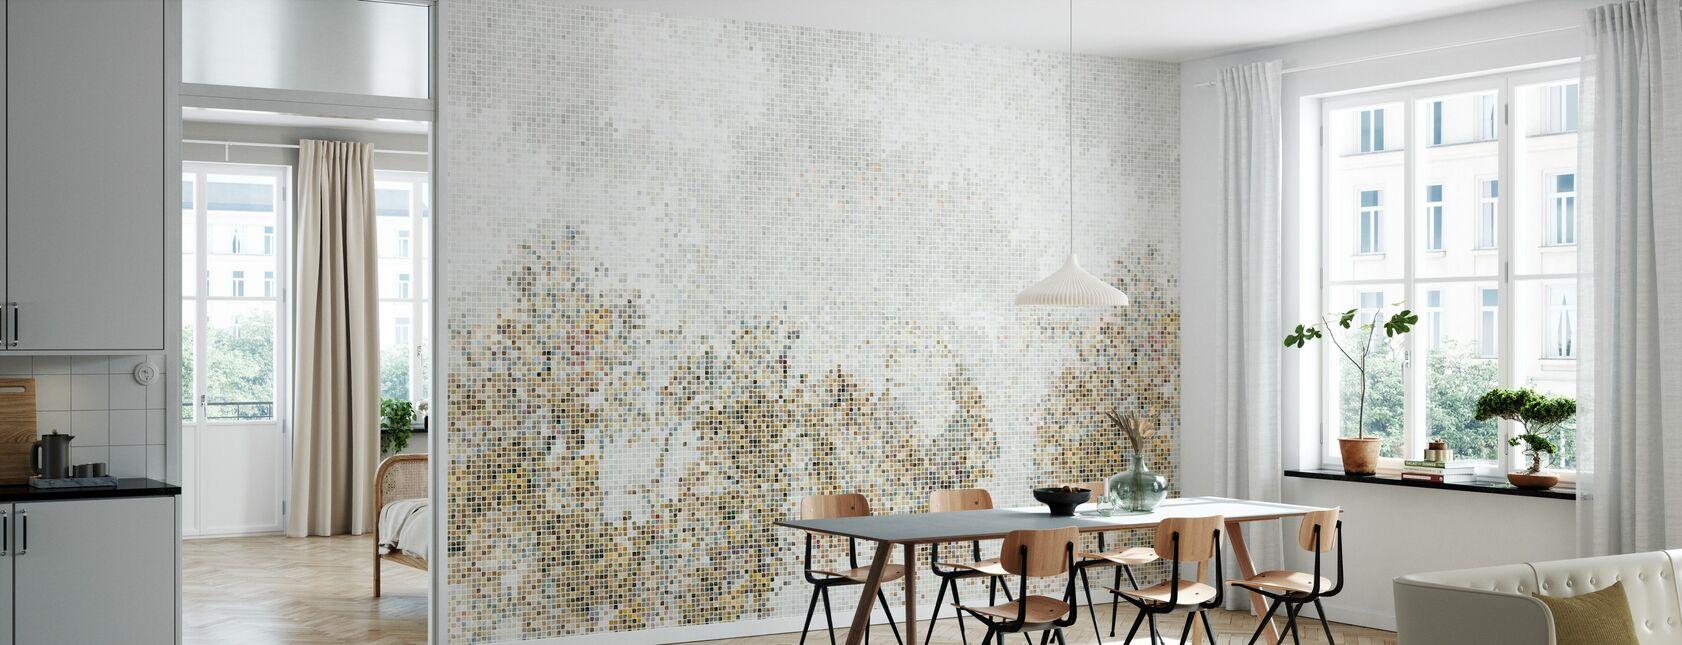 Mosaik Wald - Golden - Tapete - Küchen